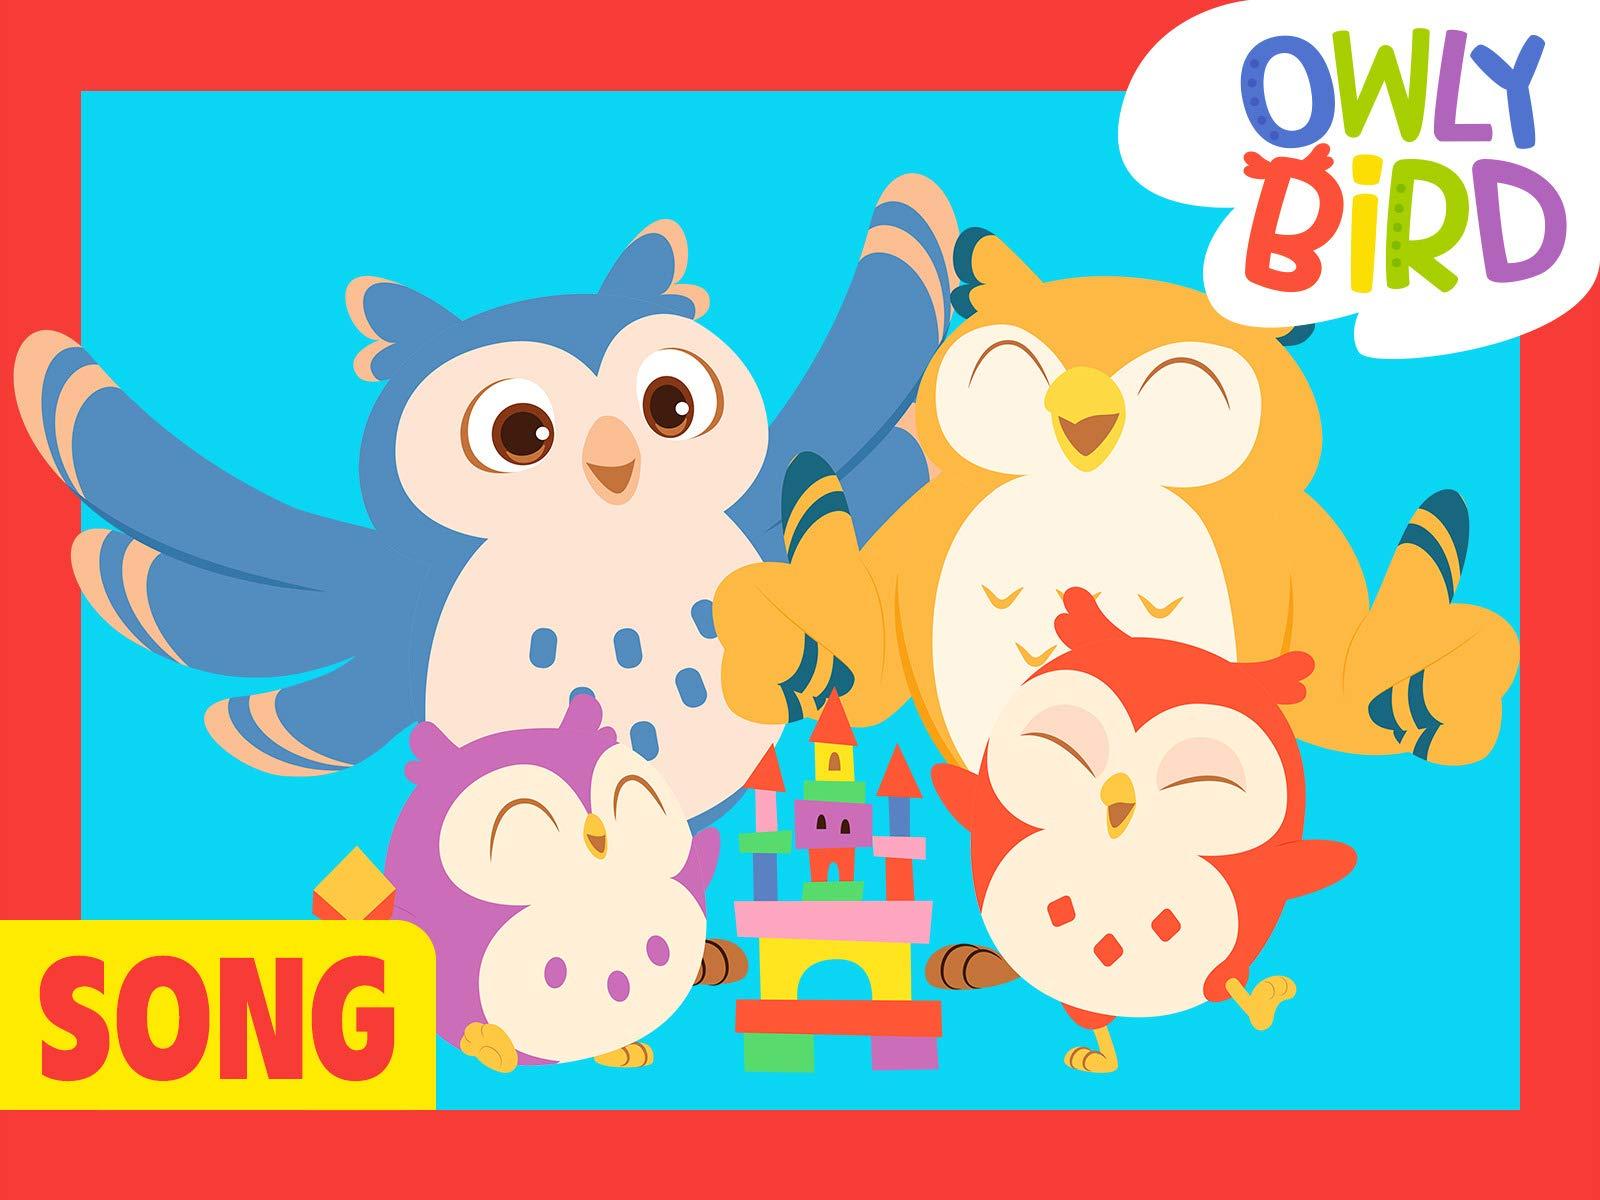 OwlyBird : Songs & Stories for Kids